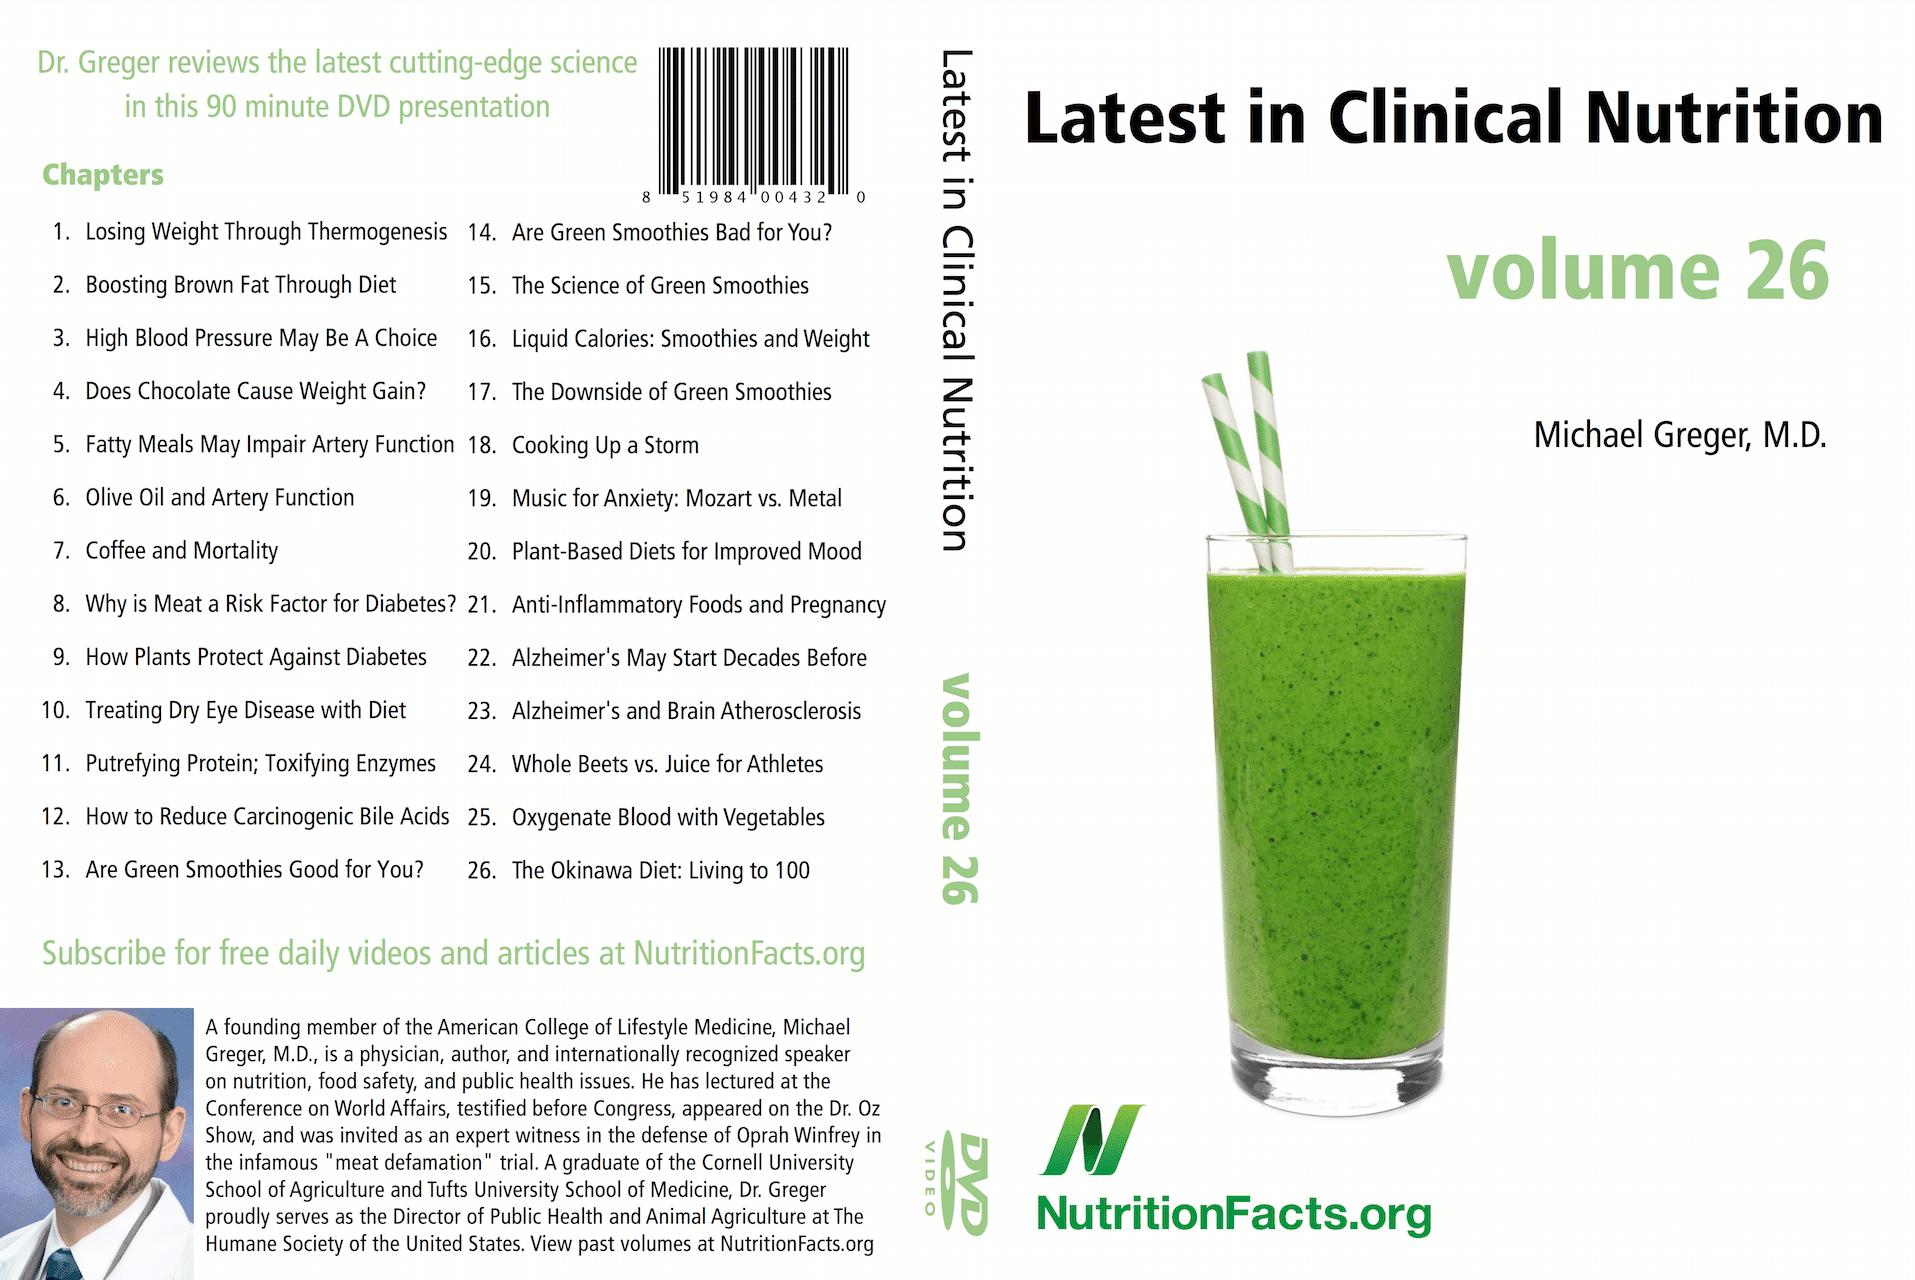 Volume 26 launch